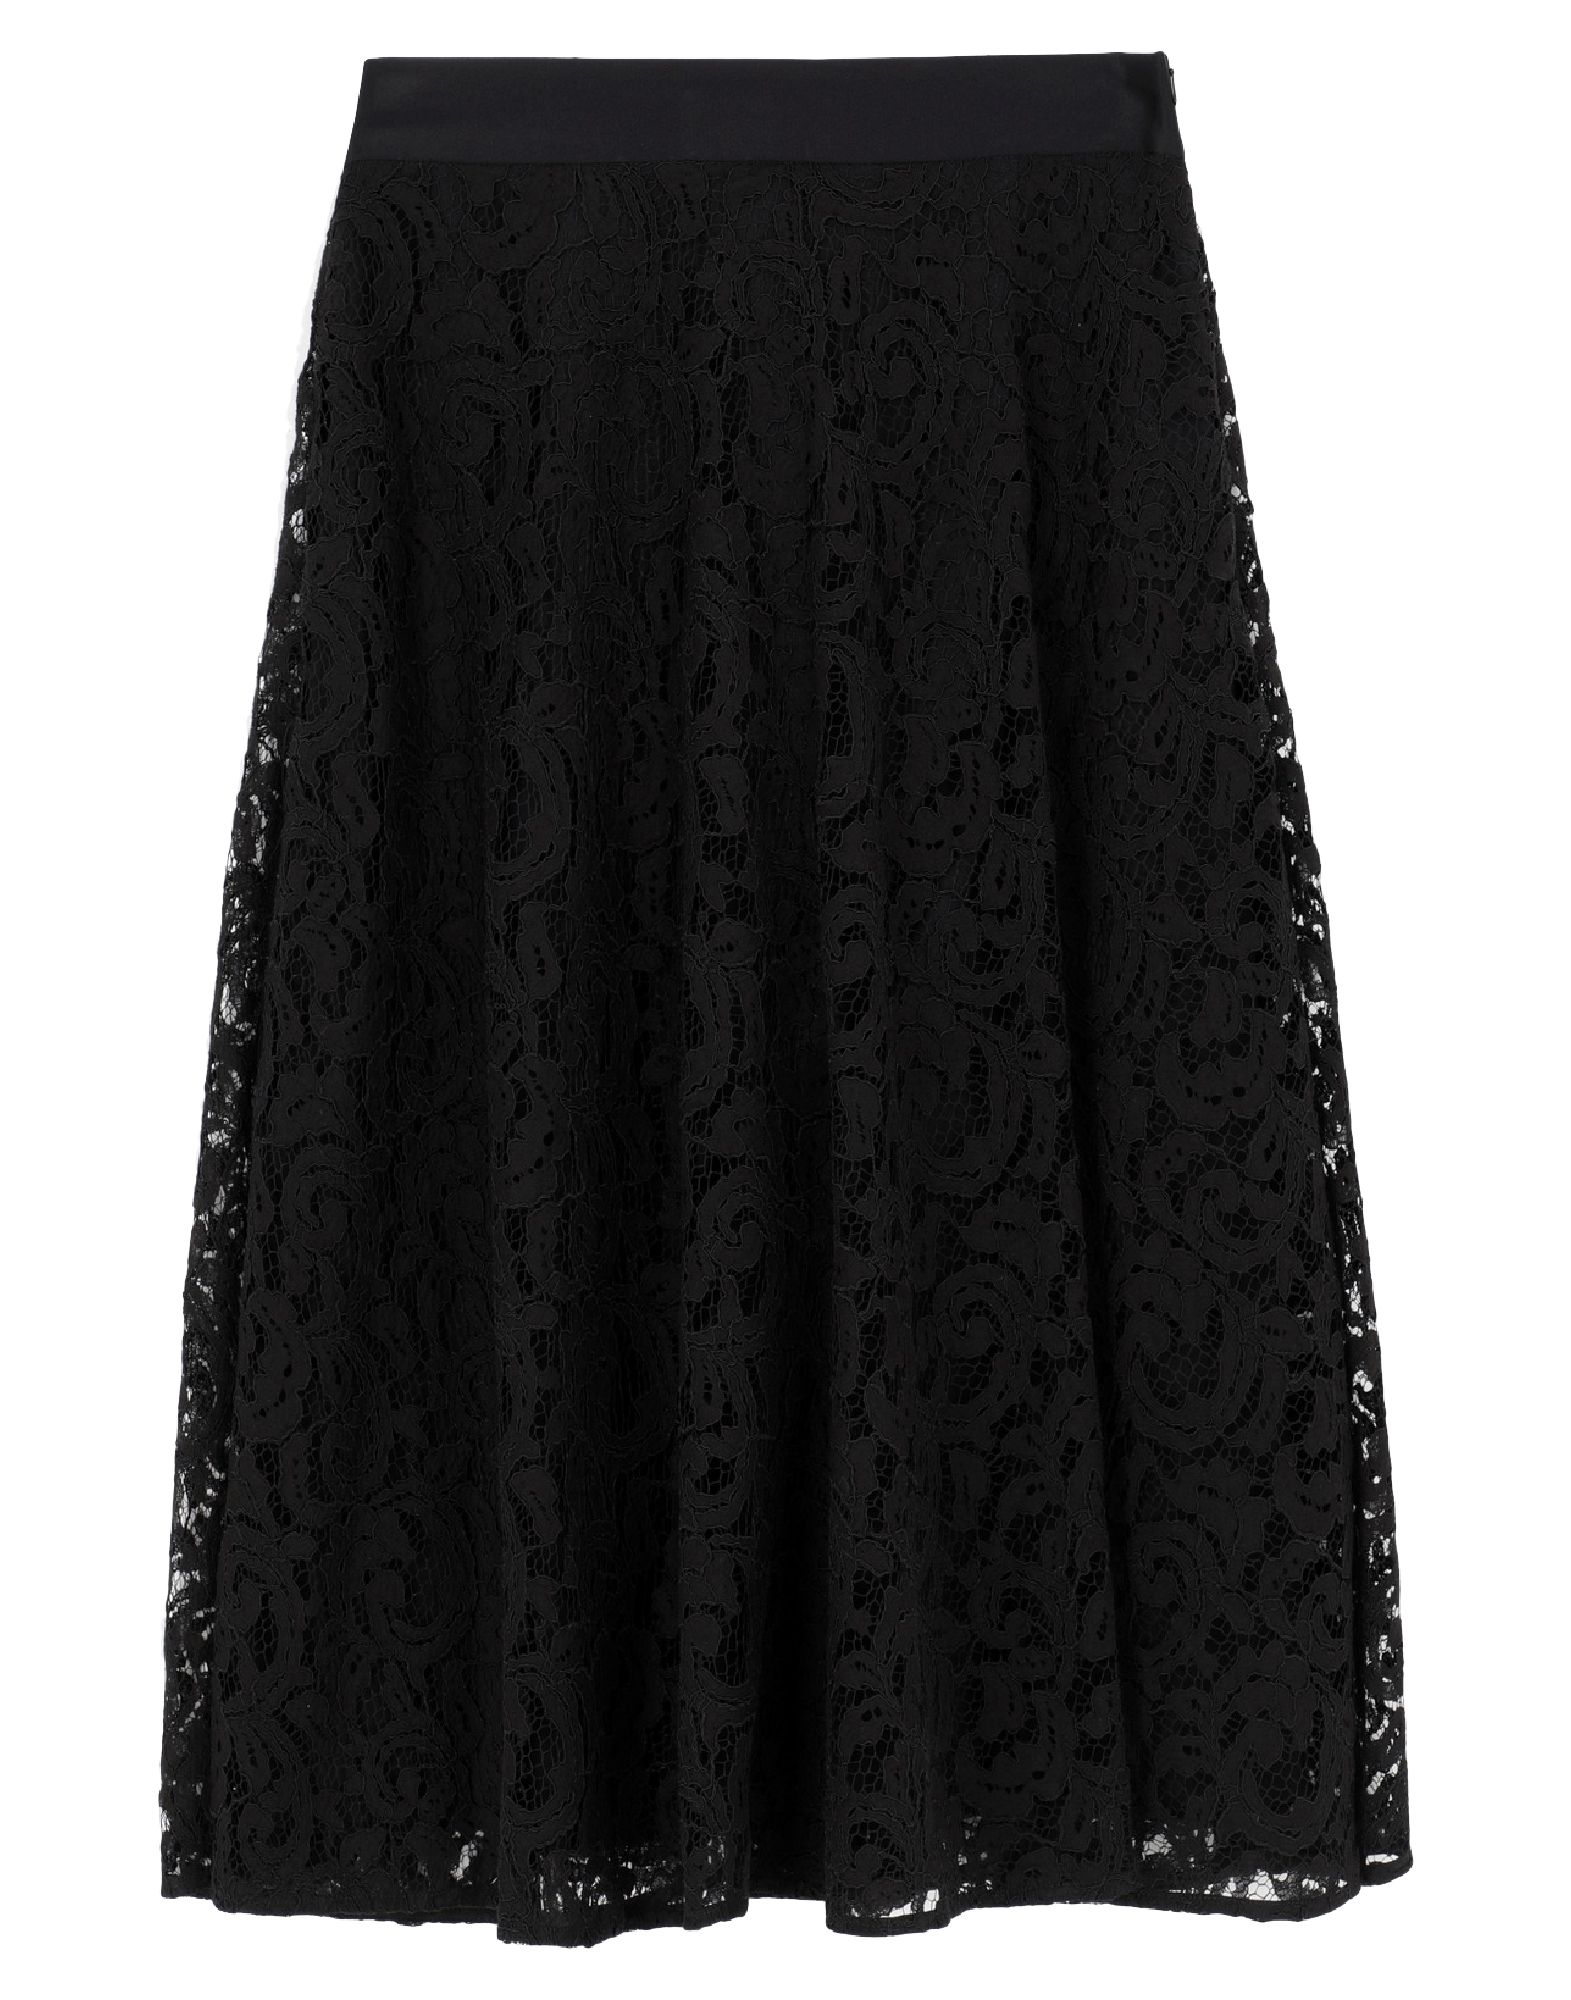 PENNYBLACK Юбка длиной 3/4 pennyblack юбка длиной 3 4